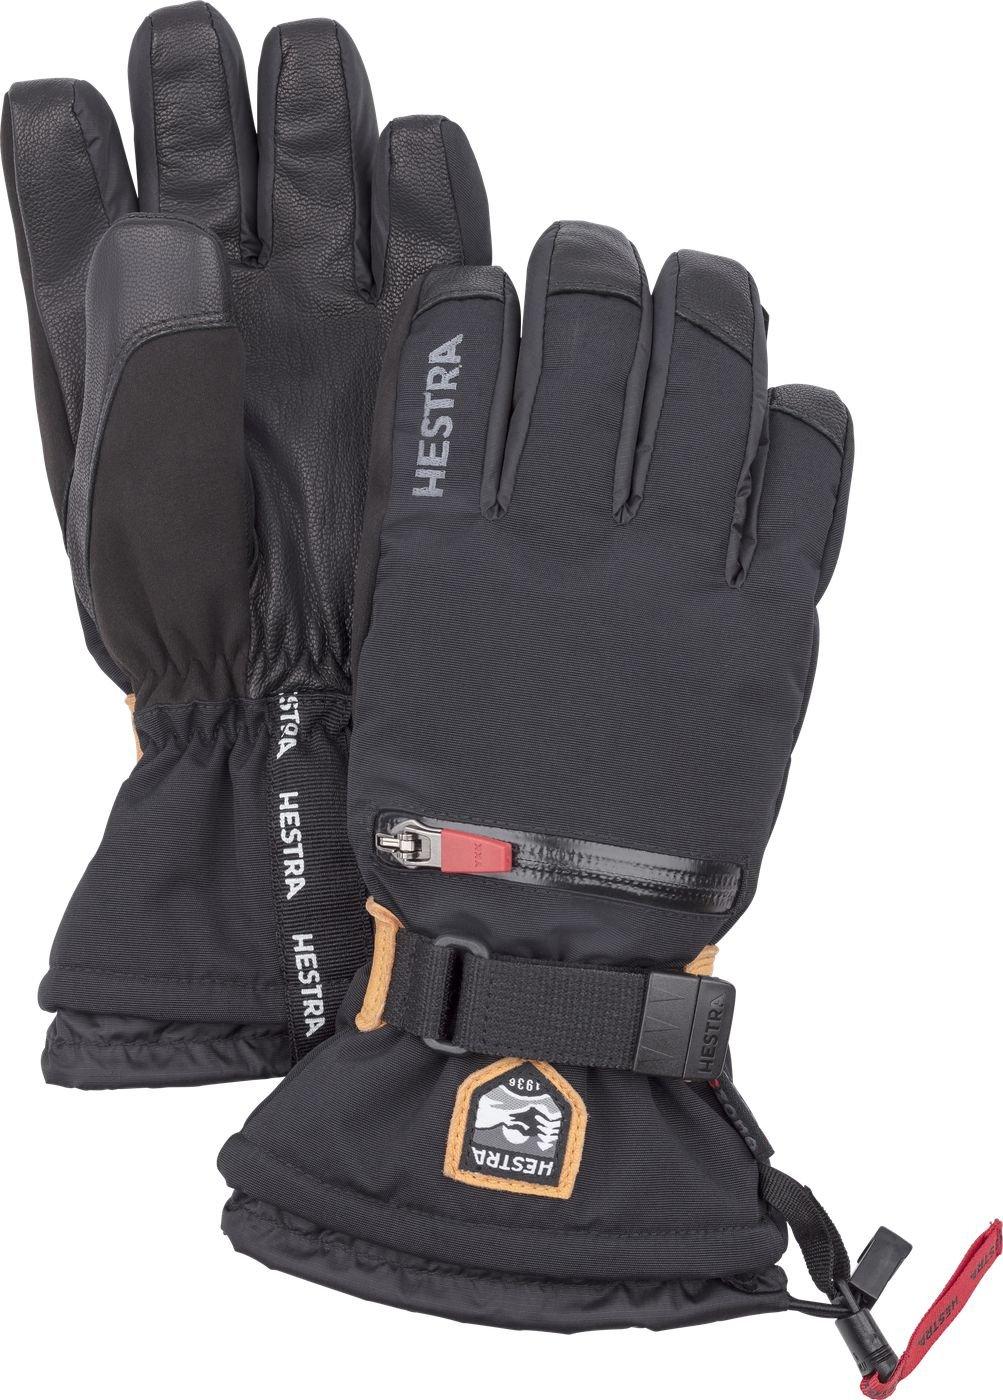 Hestra All Mountain CZone Jr. Glove